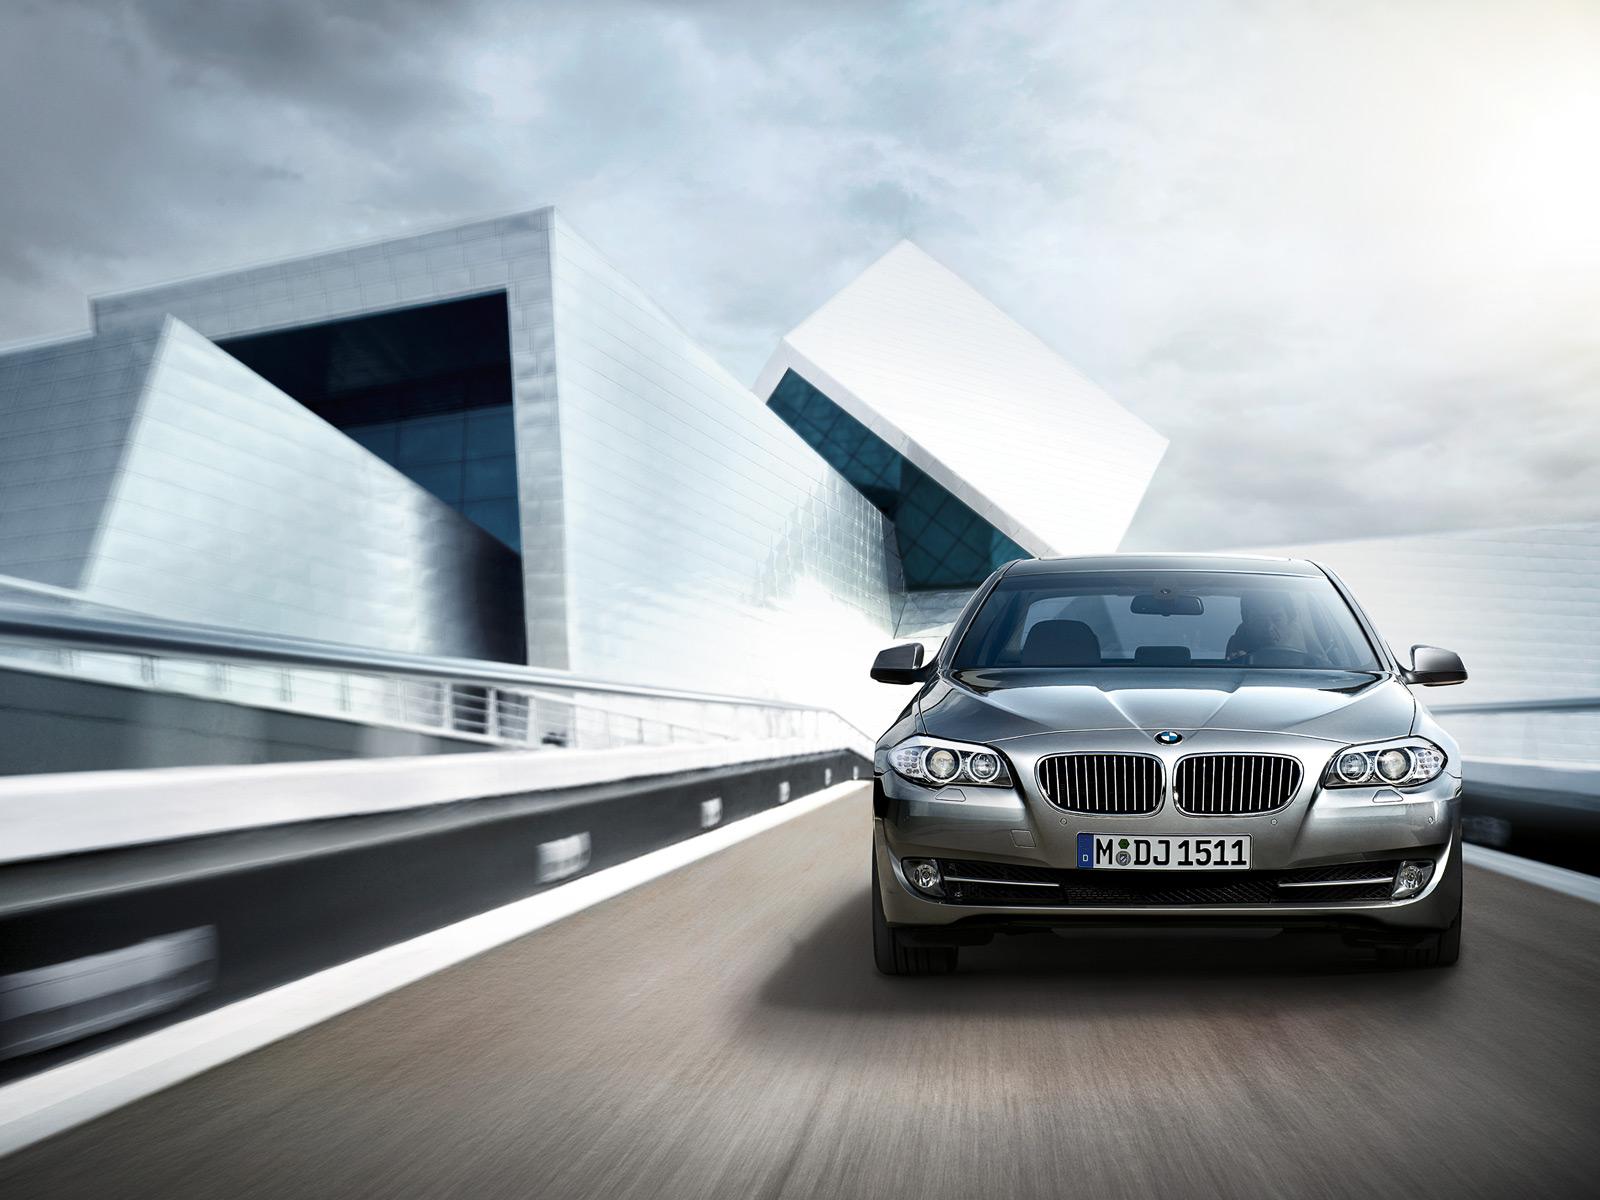 BMW Series Sedan I In UAE New Car Prices Specs - 2012 bmw 530i